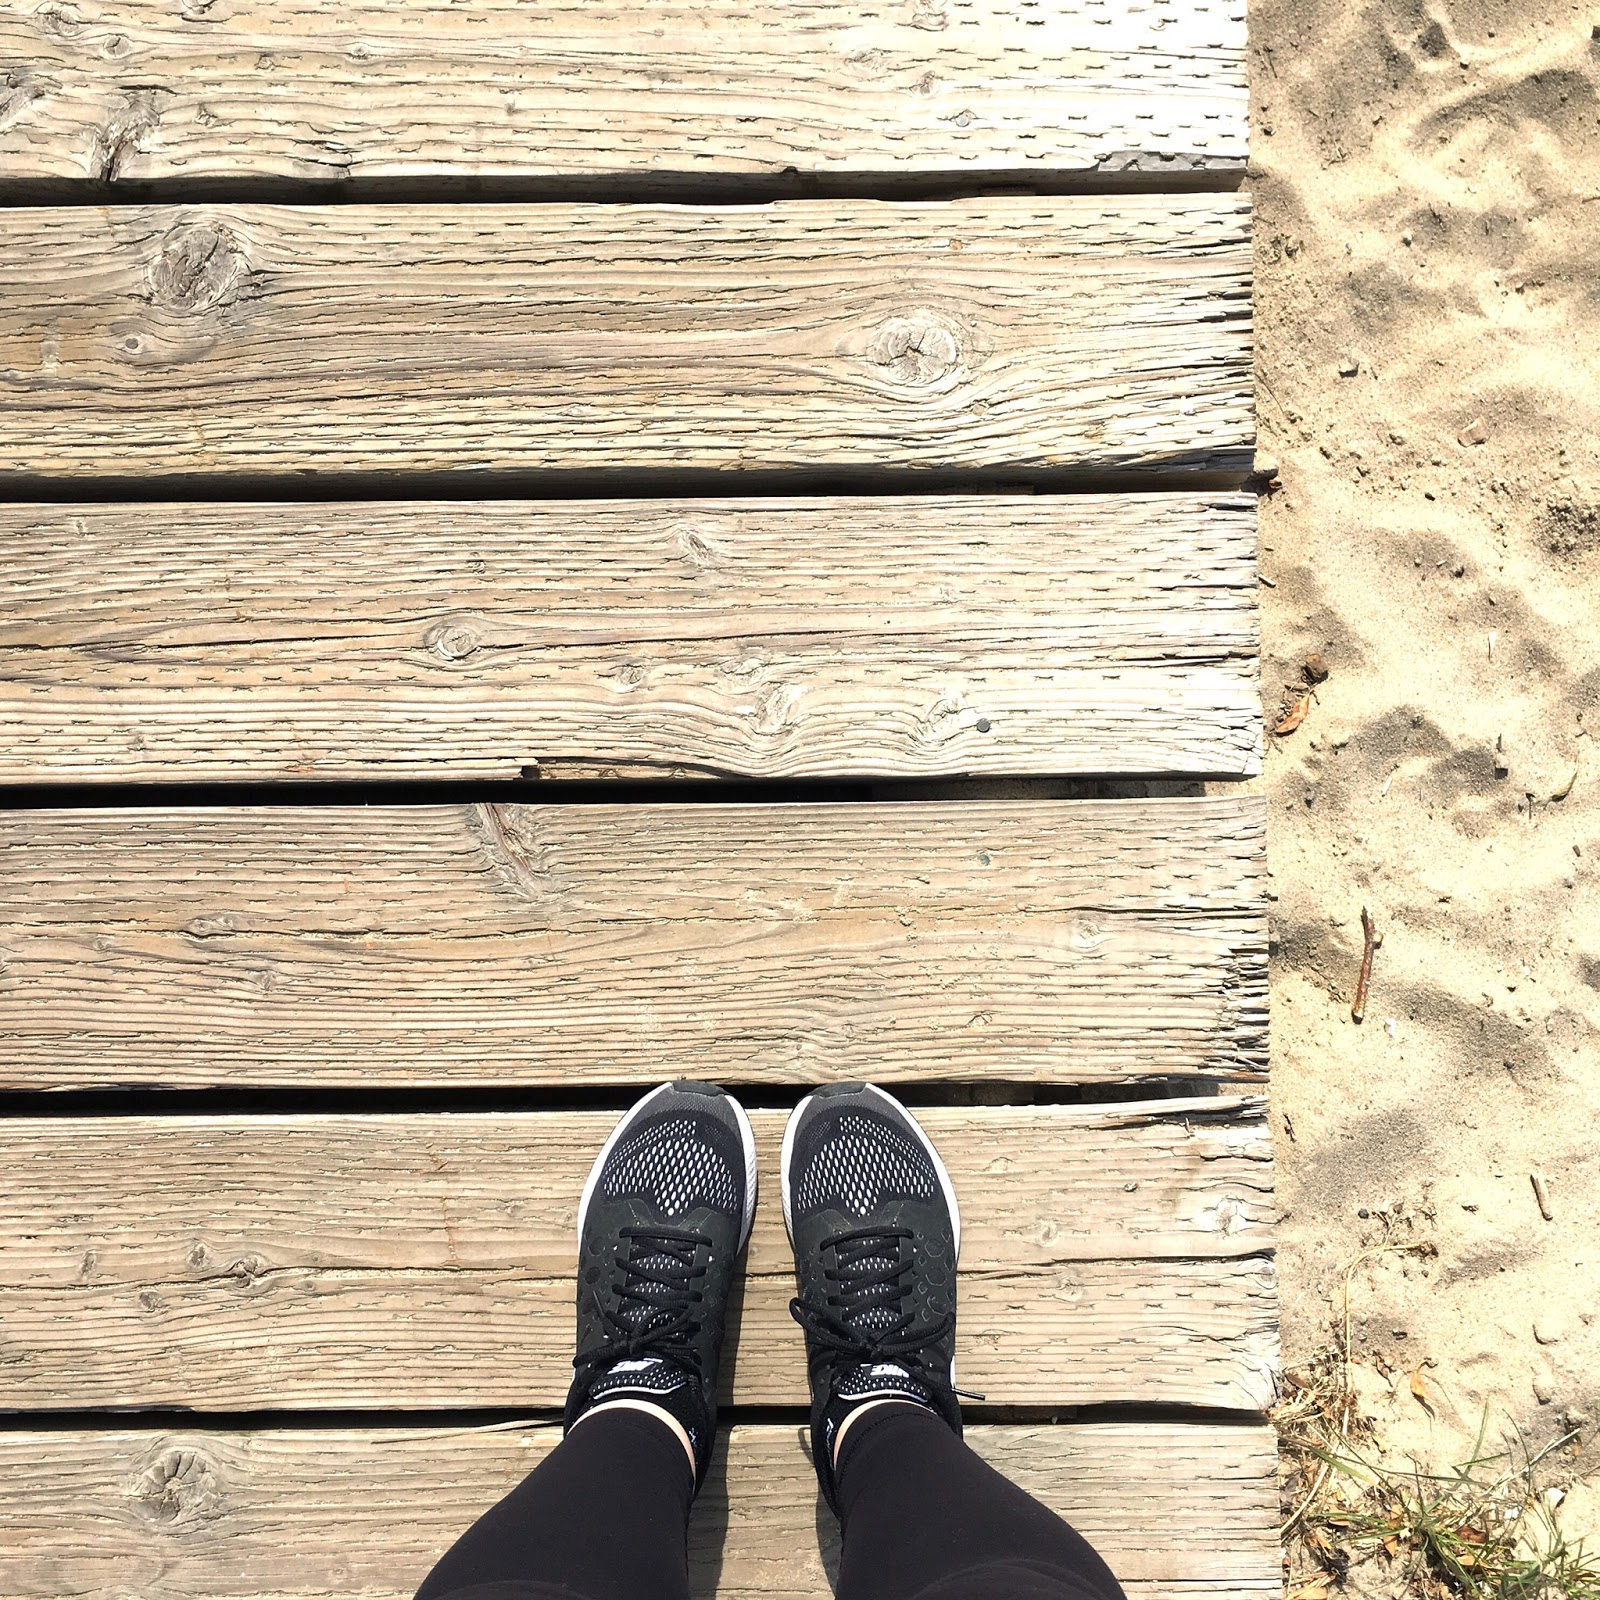 Nike Running Shoes and Lululemon Leggings